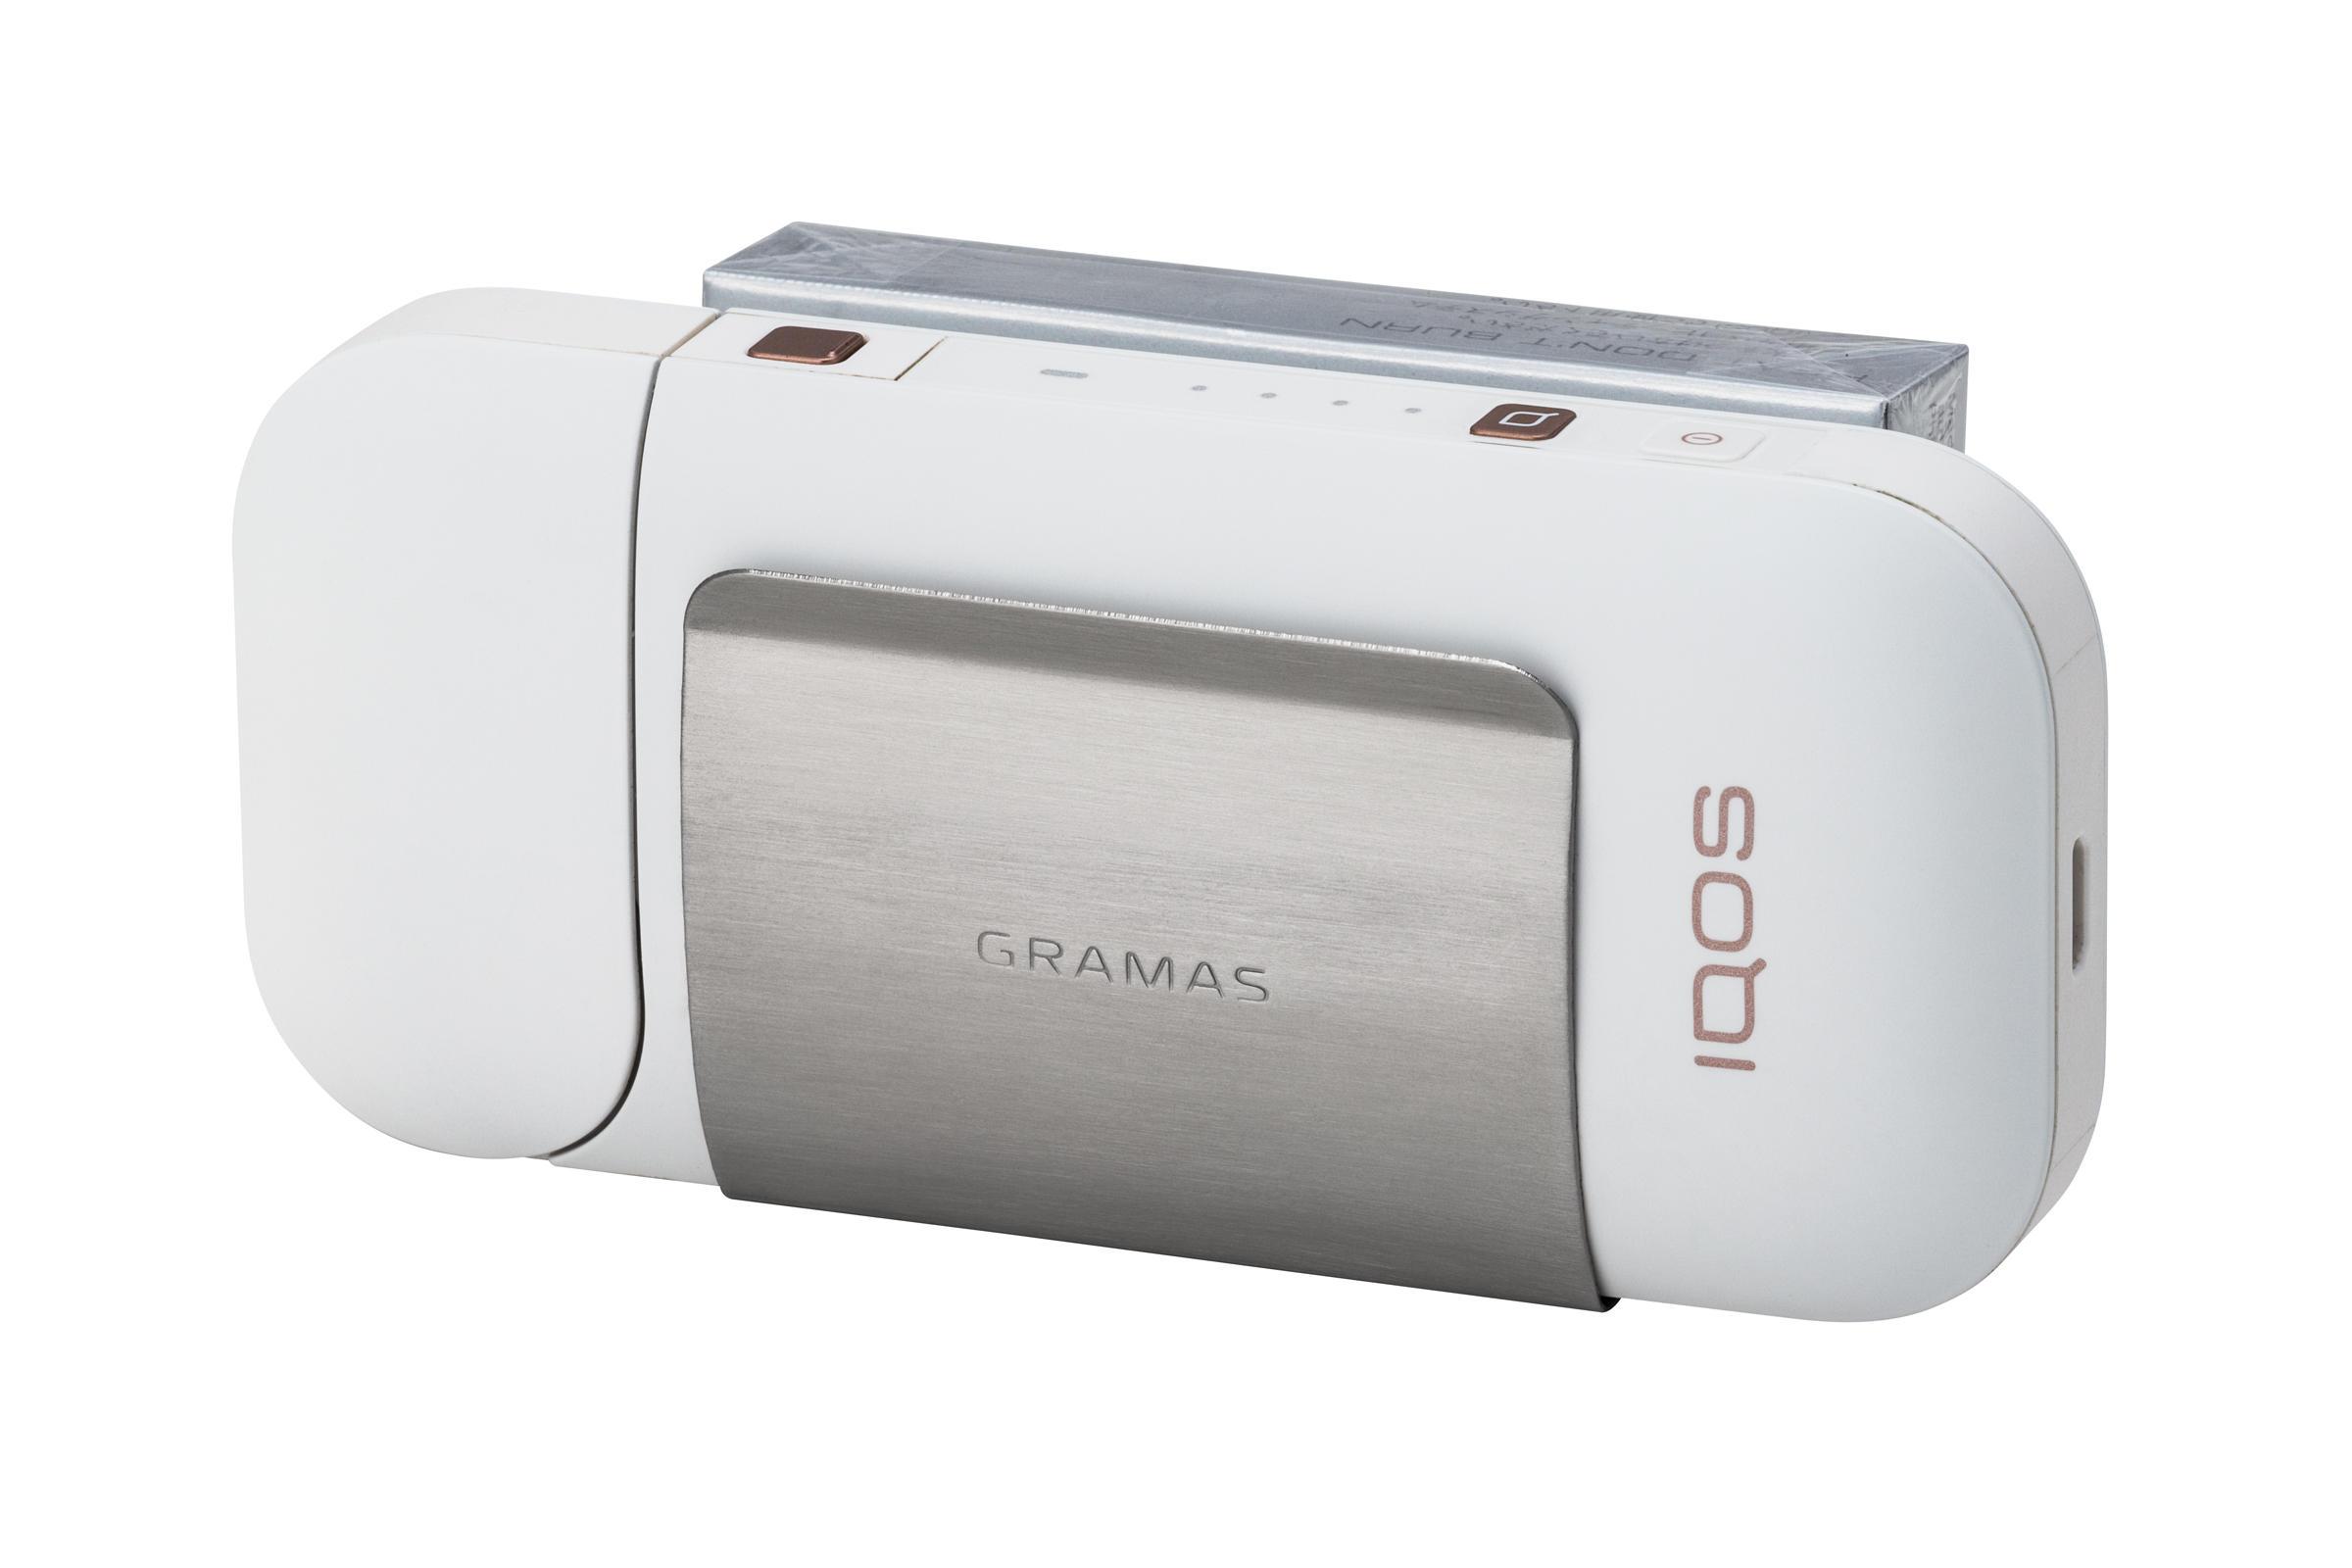 GIQC5007HS_IQOS.jpg